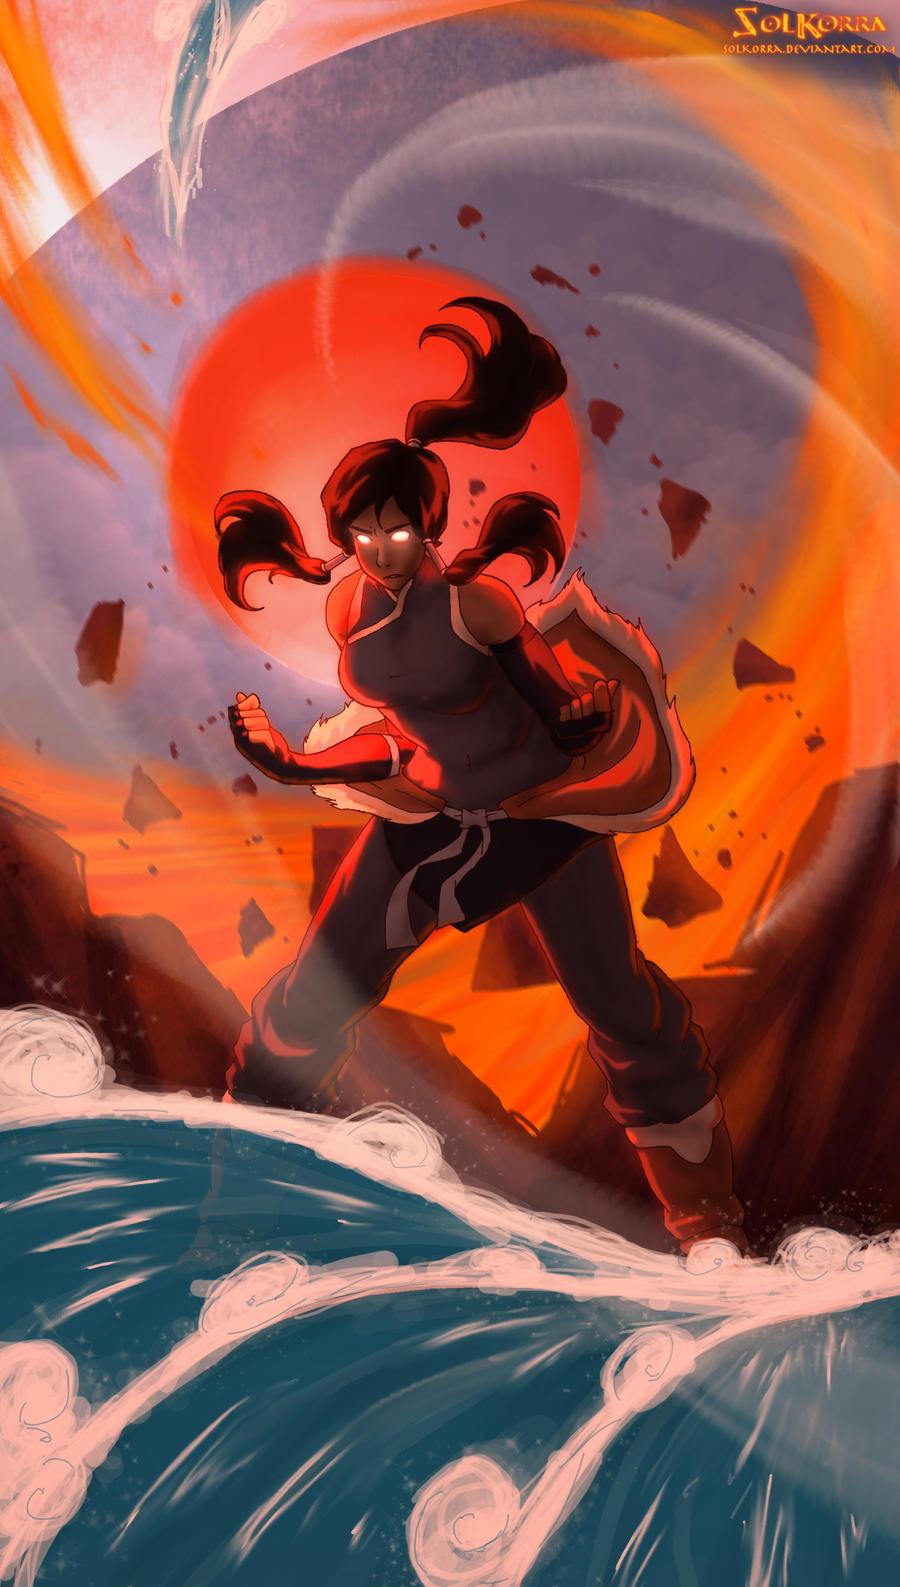 Korra Avatar State Power by SolKorra on DeviantArt Aang Avatar State Korra